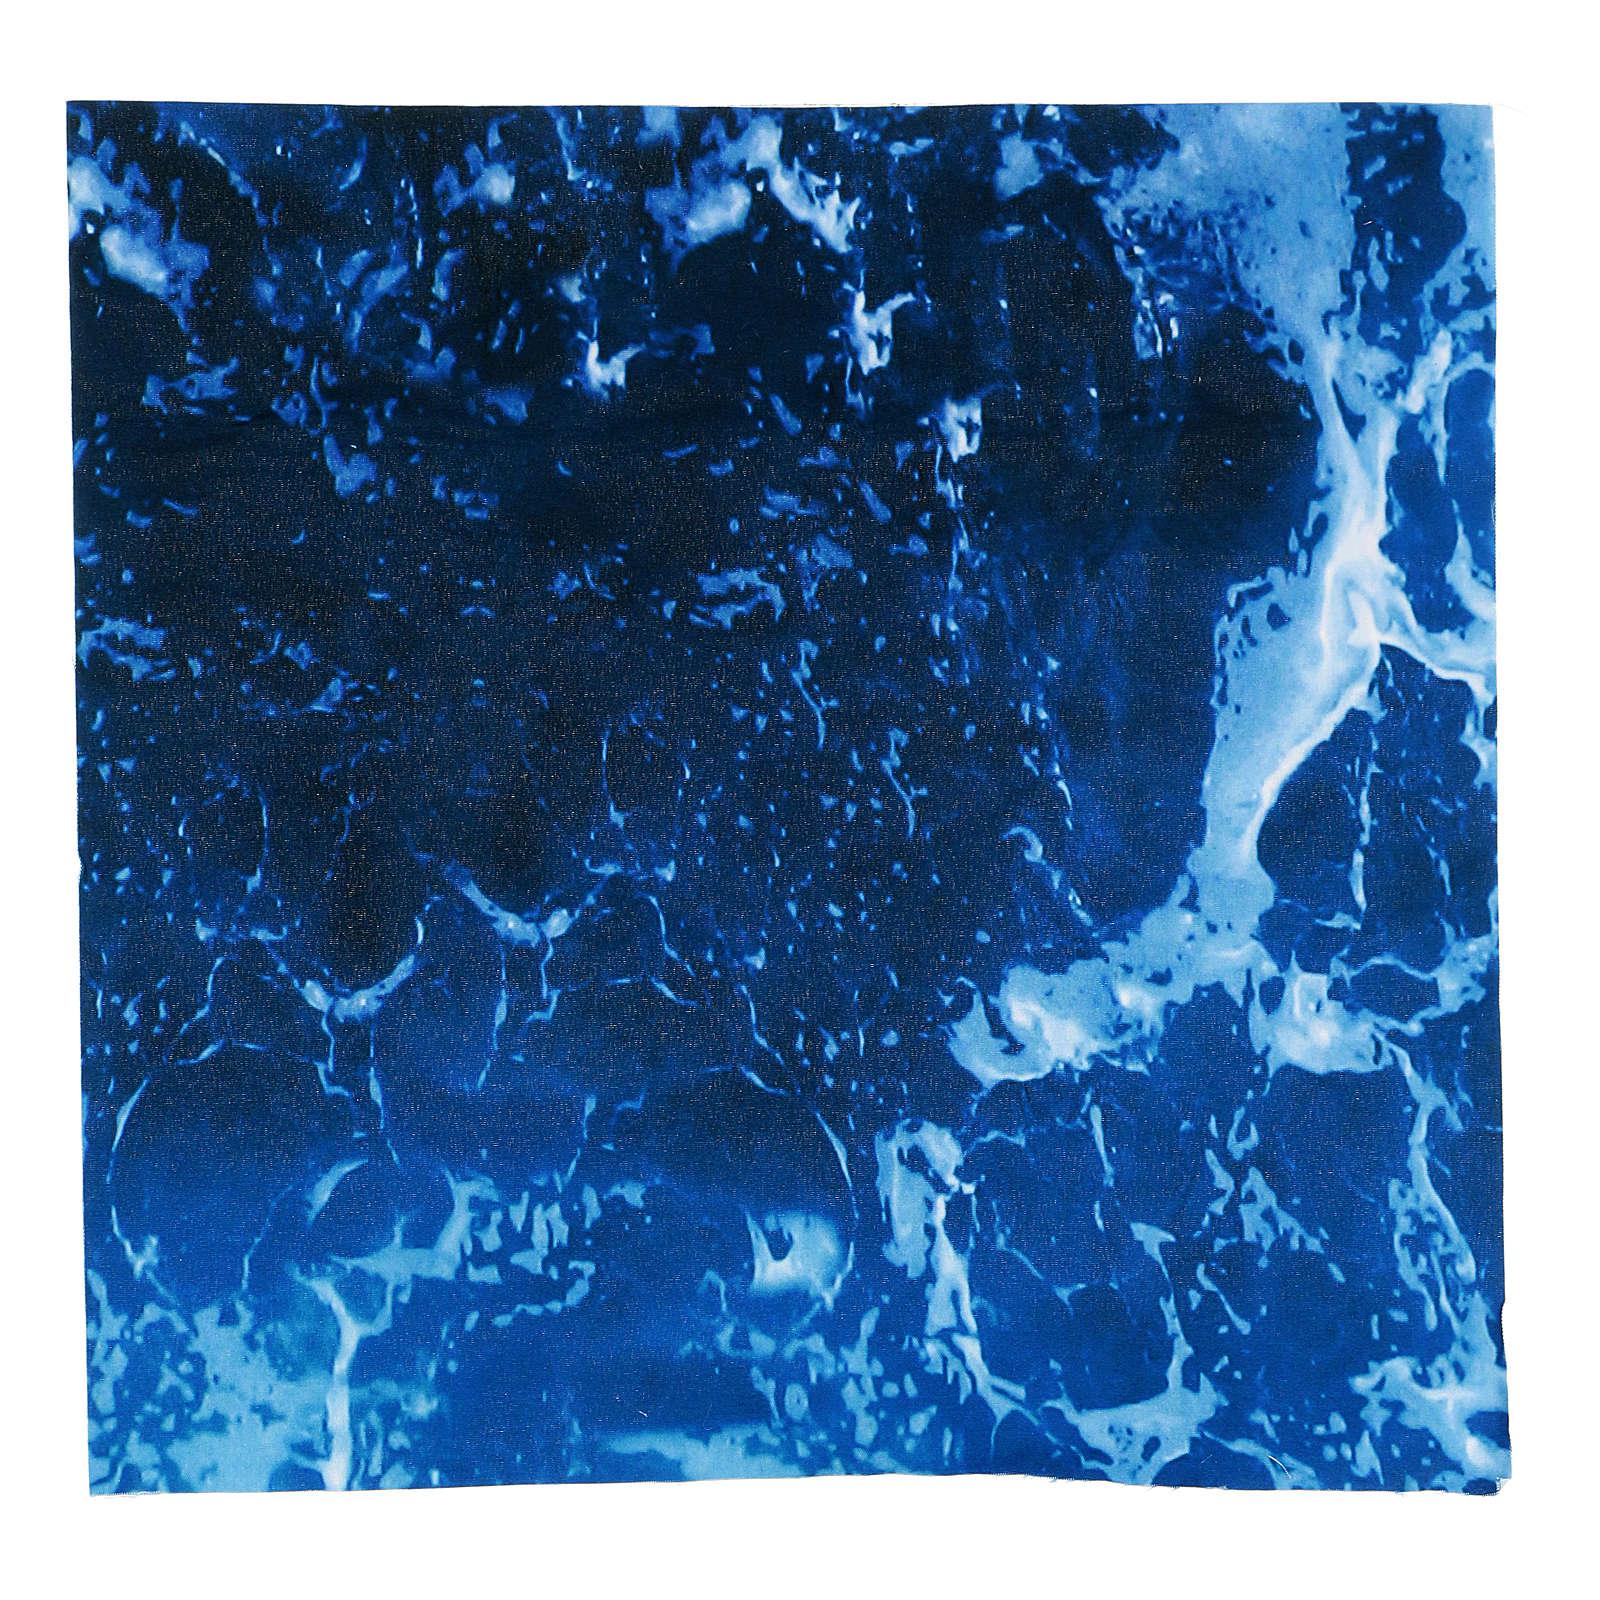 Carta plasmabile acqua 30x30 cm per presepi 4